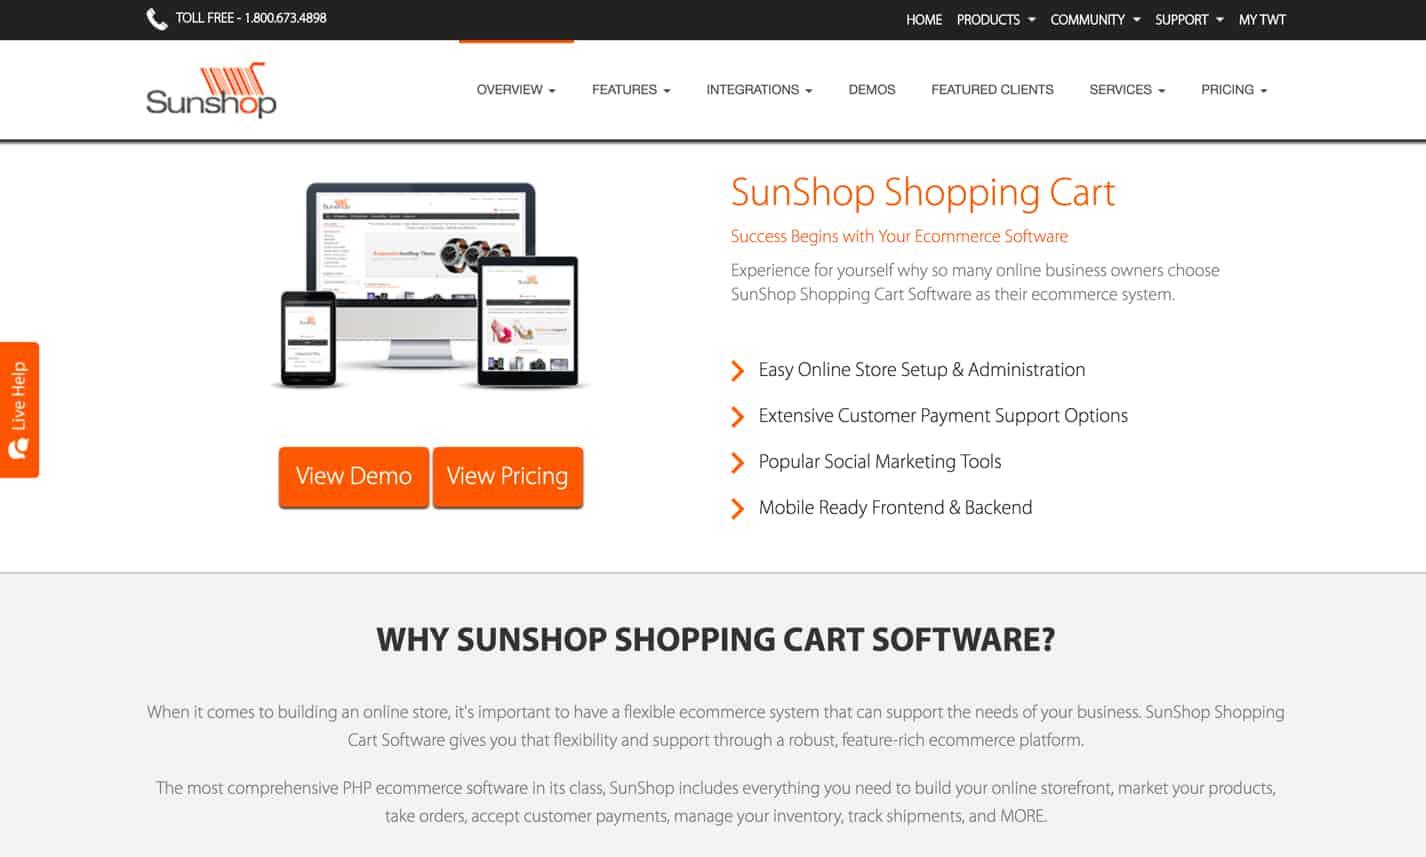 SunShop Shopping Cart review